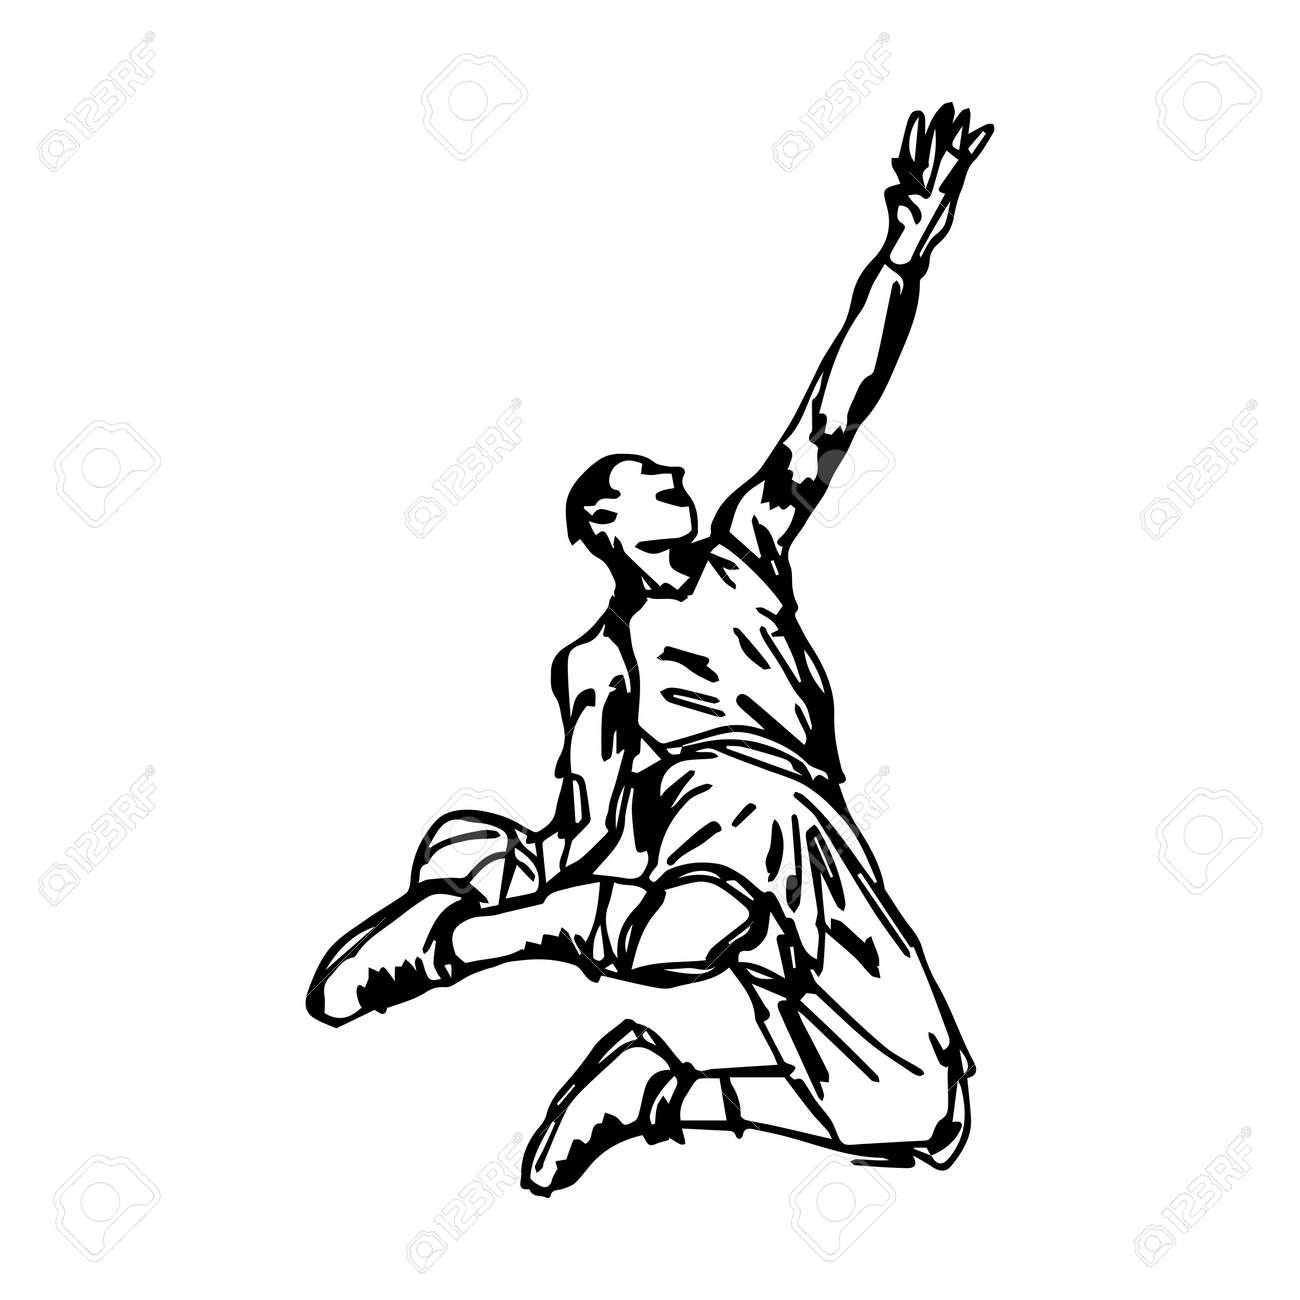 Basketball player making slam dunk vector illustration sketch 75564163 basketball player making slam dunk vector illustration sketch hand drawn isolated on